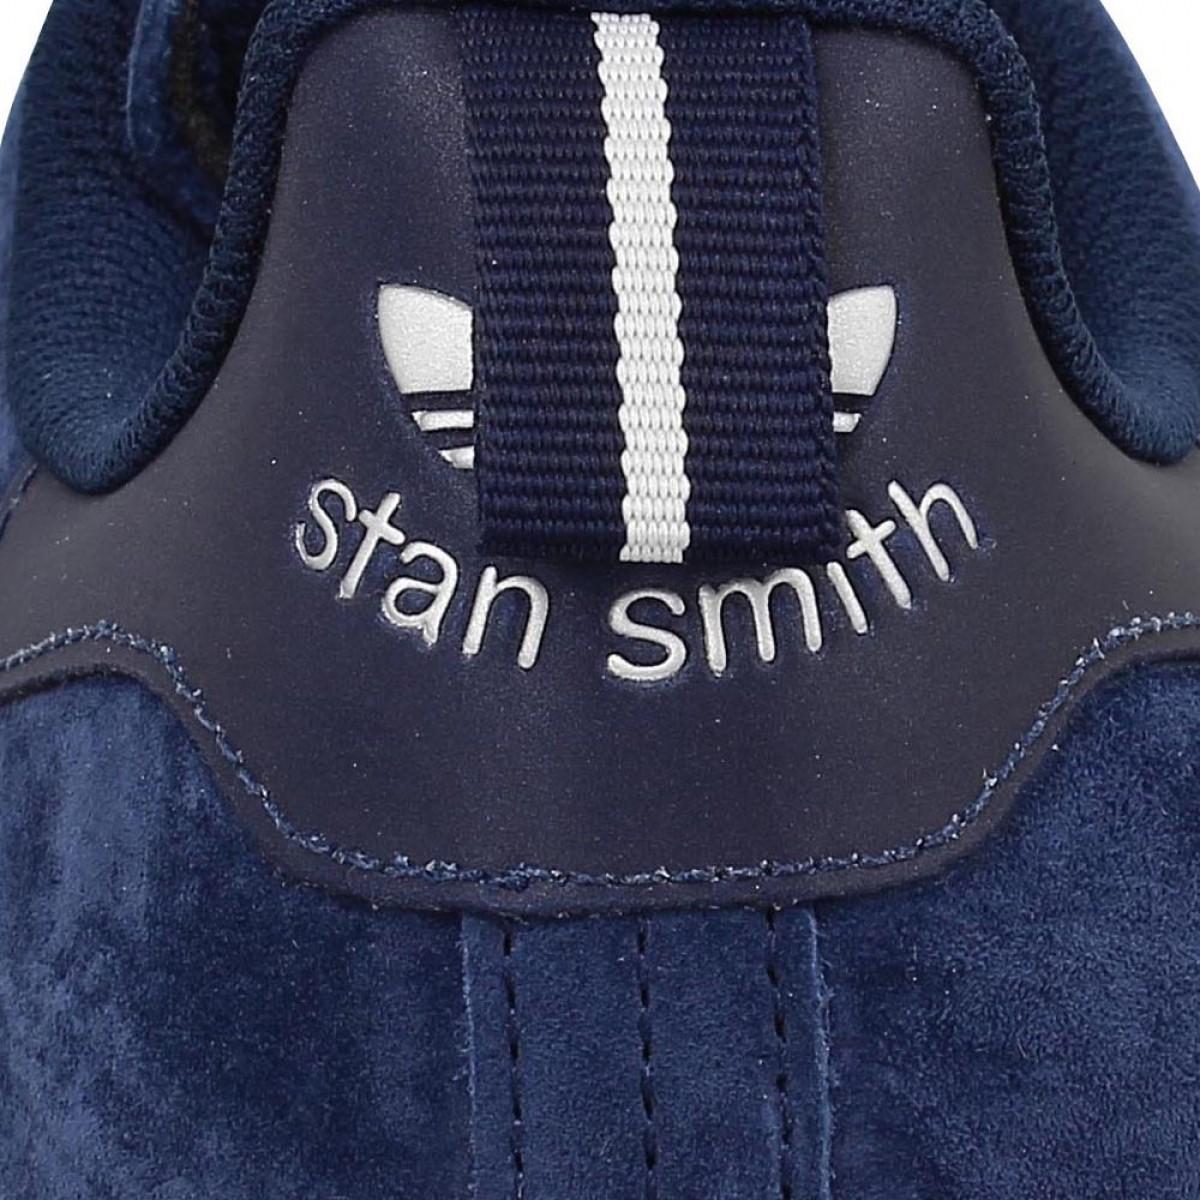 ADIDAS Stan Smith velours Homme Marine